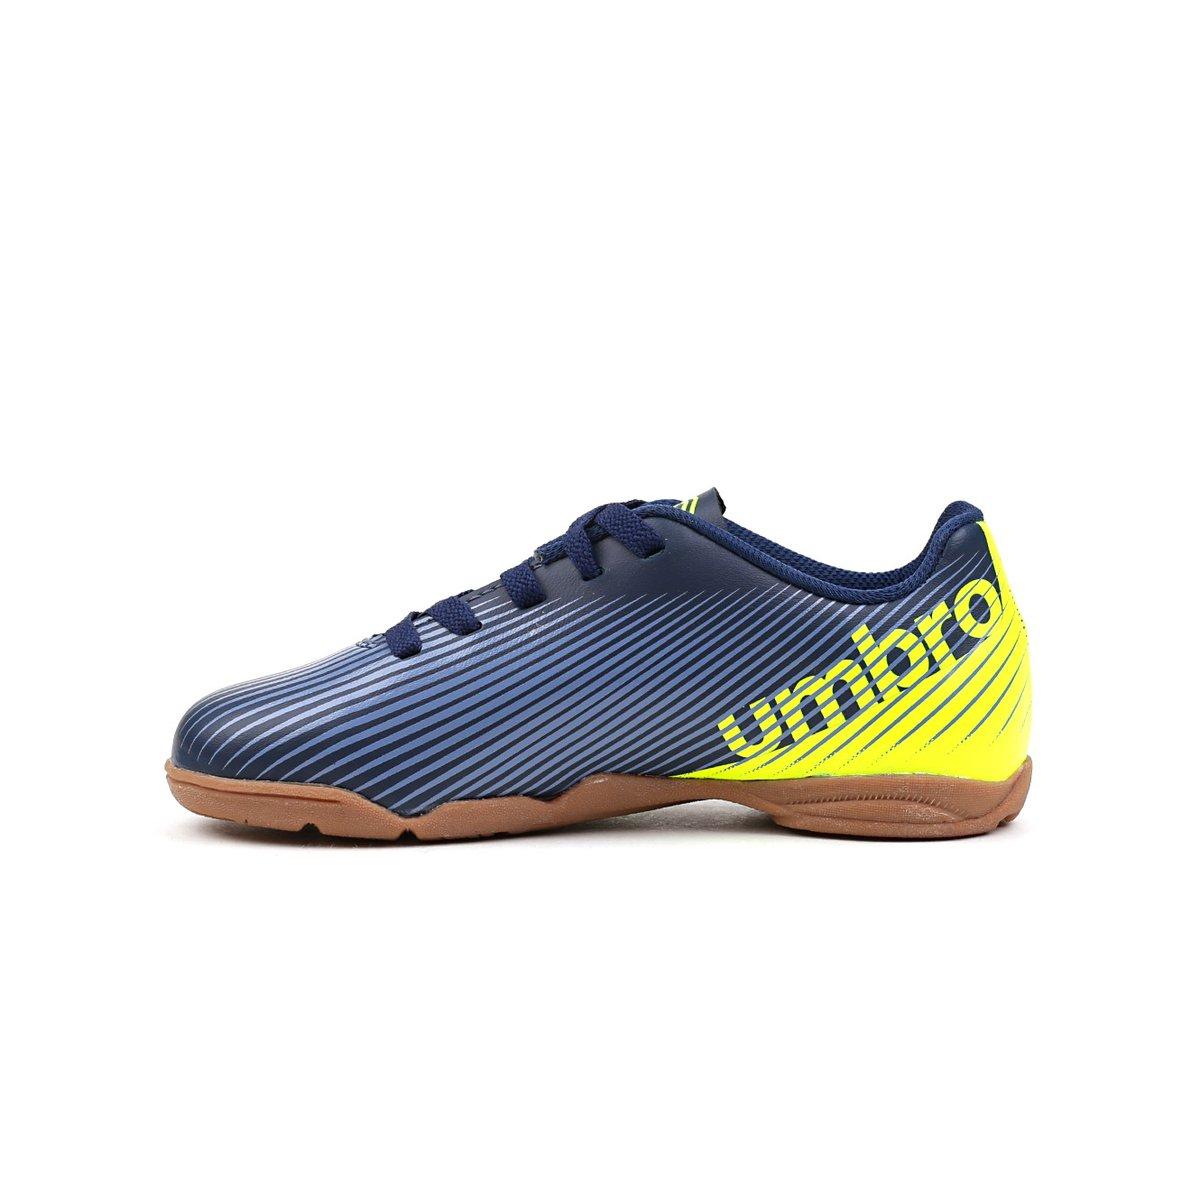 5fc140b772 ... Tênis de Futsal Infantil Para Menino Umbro Speed Ii Jr Azul marinho verde  ...